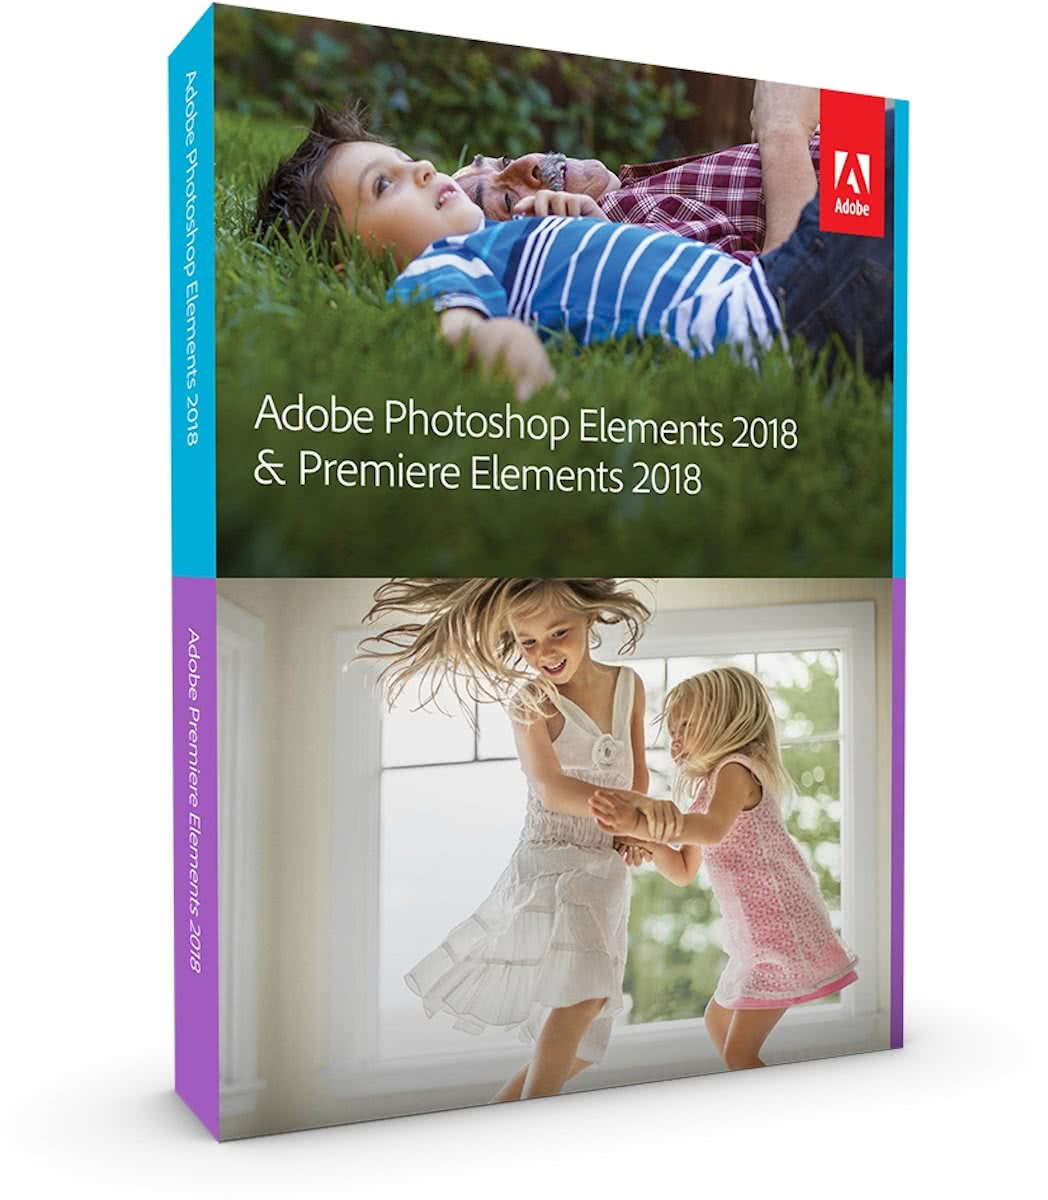 Adobe Adobe Photoshop Elements 2018 + Premiere Elements 2018 PC (Dutch) (65281762)